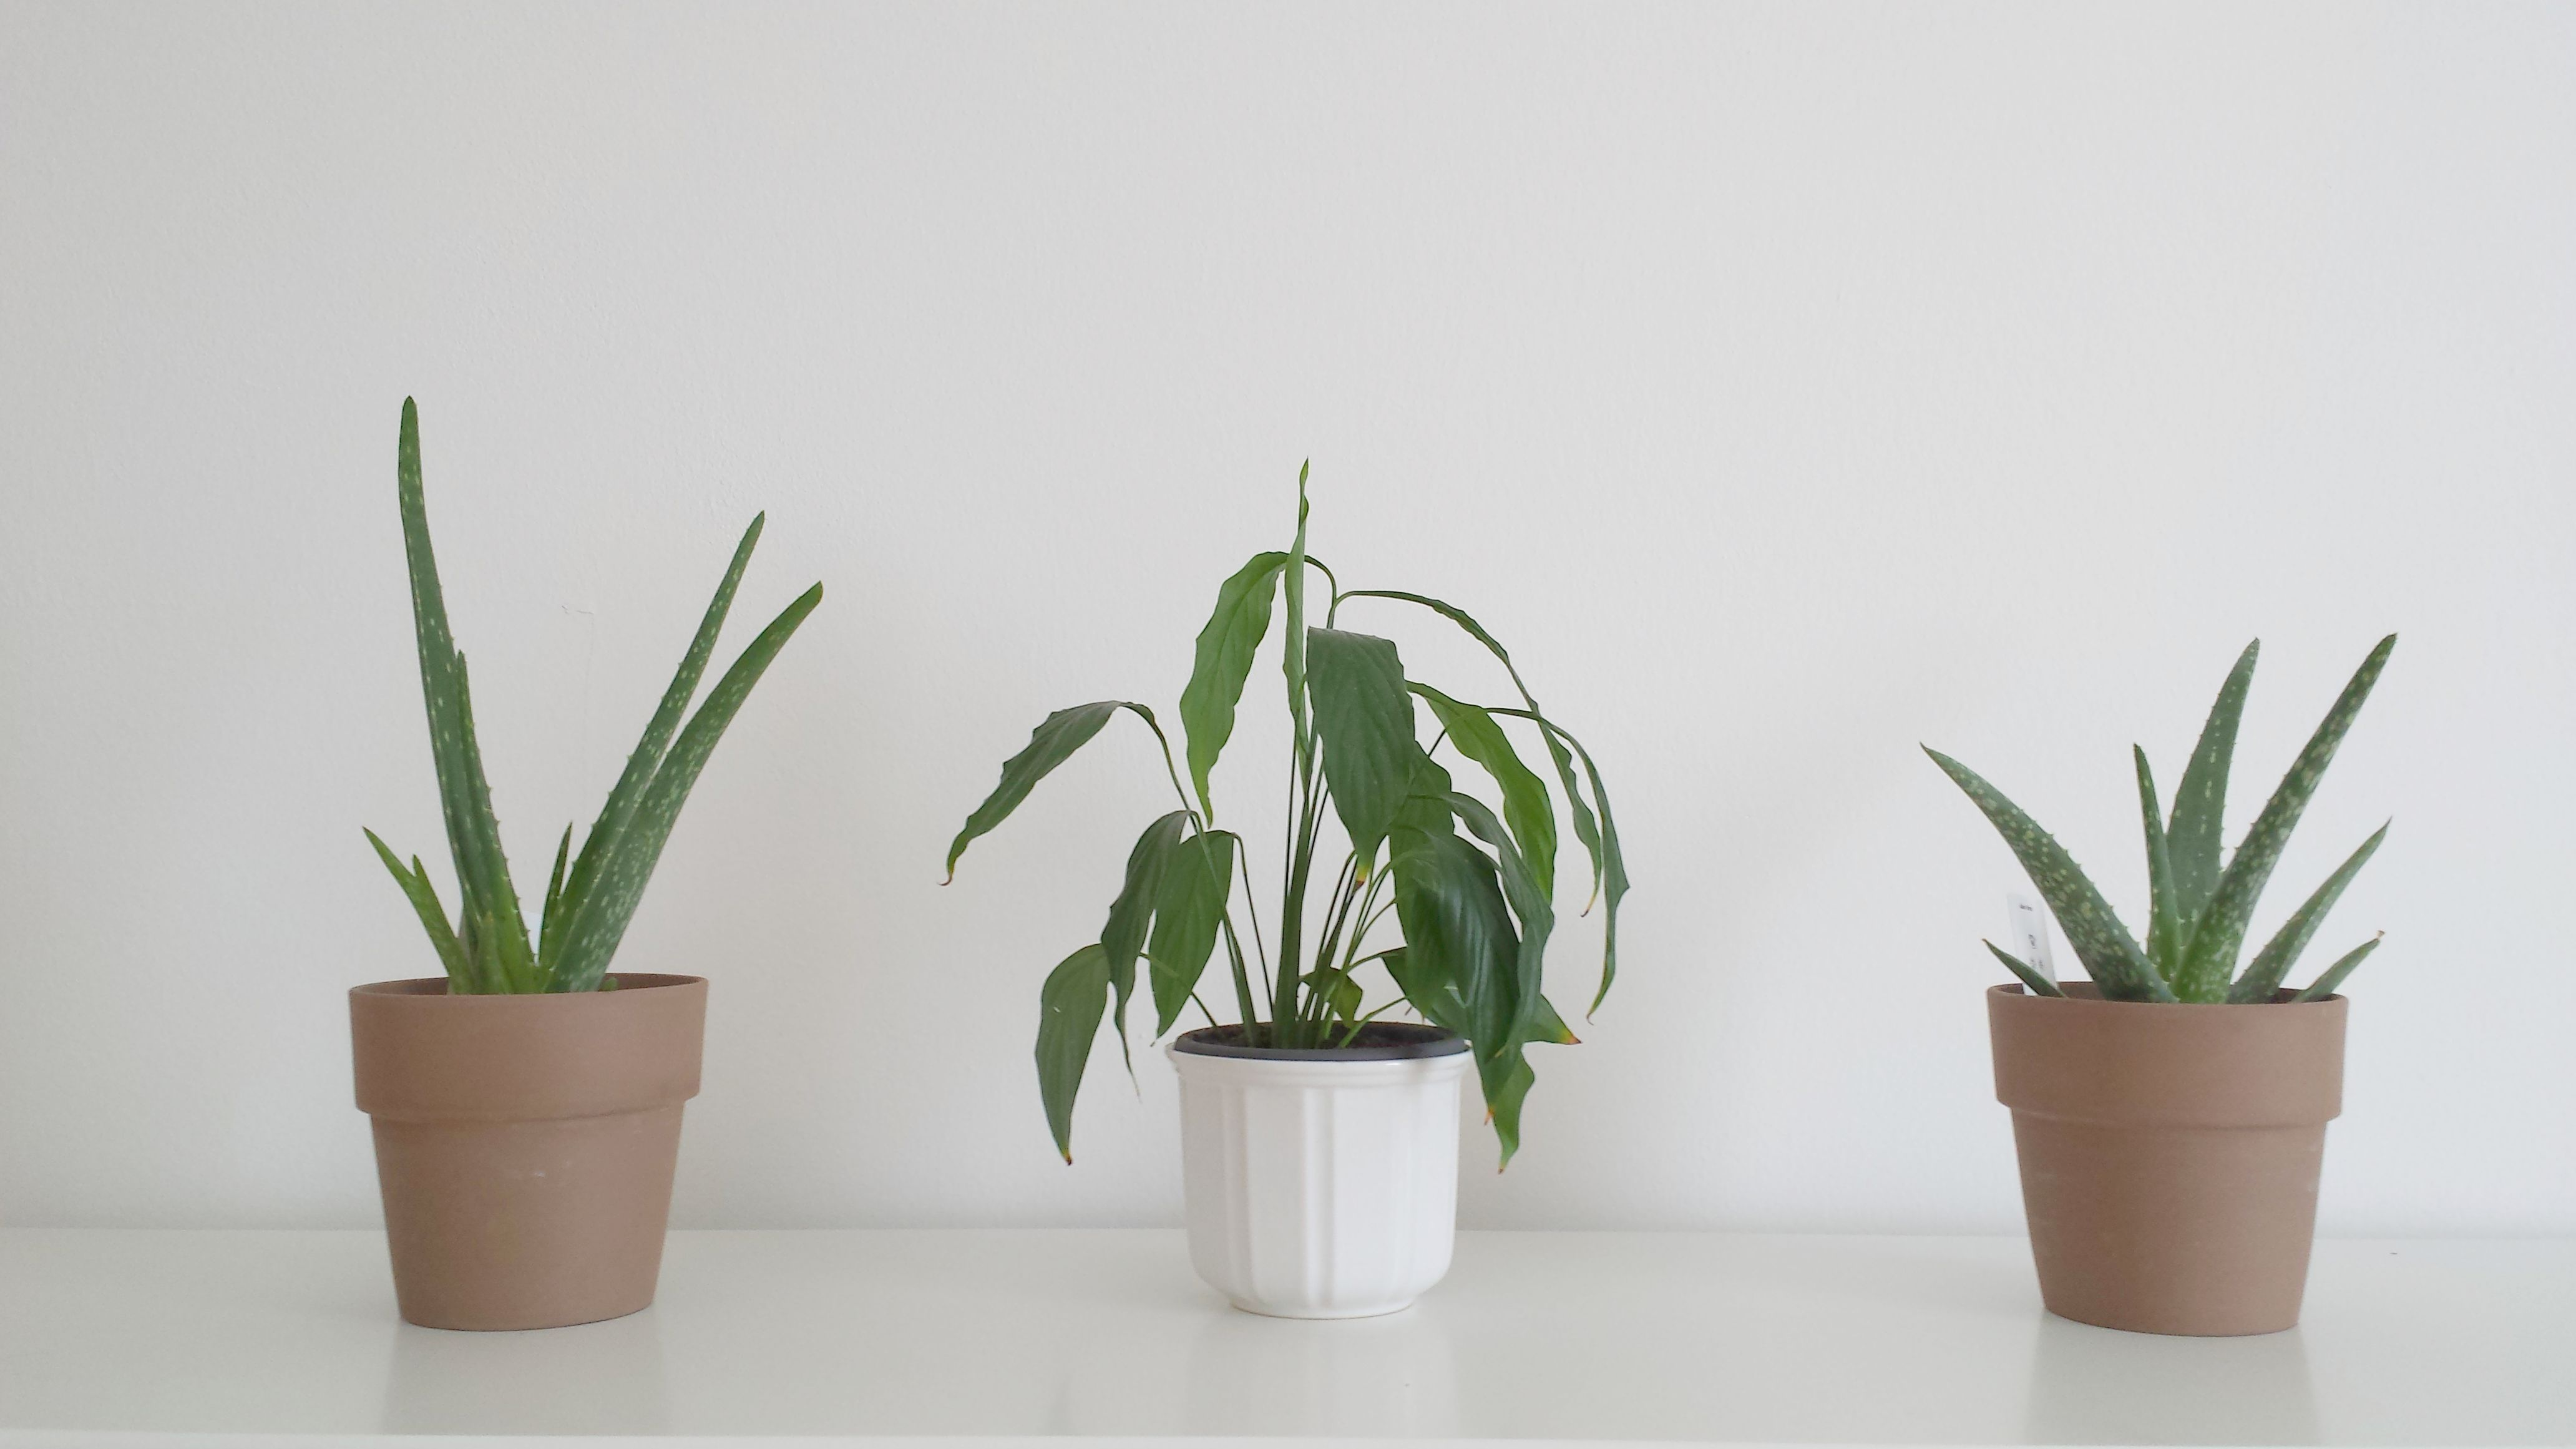 Pflanzen Schlafzimmer Pflanzen Schlafzimmer Pflanzen Schlafzimmer  [149923457638750]